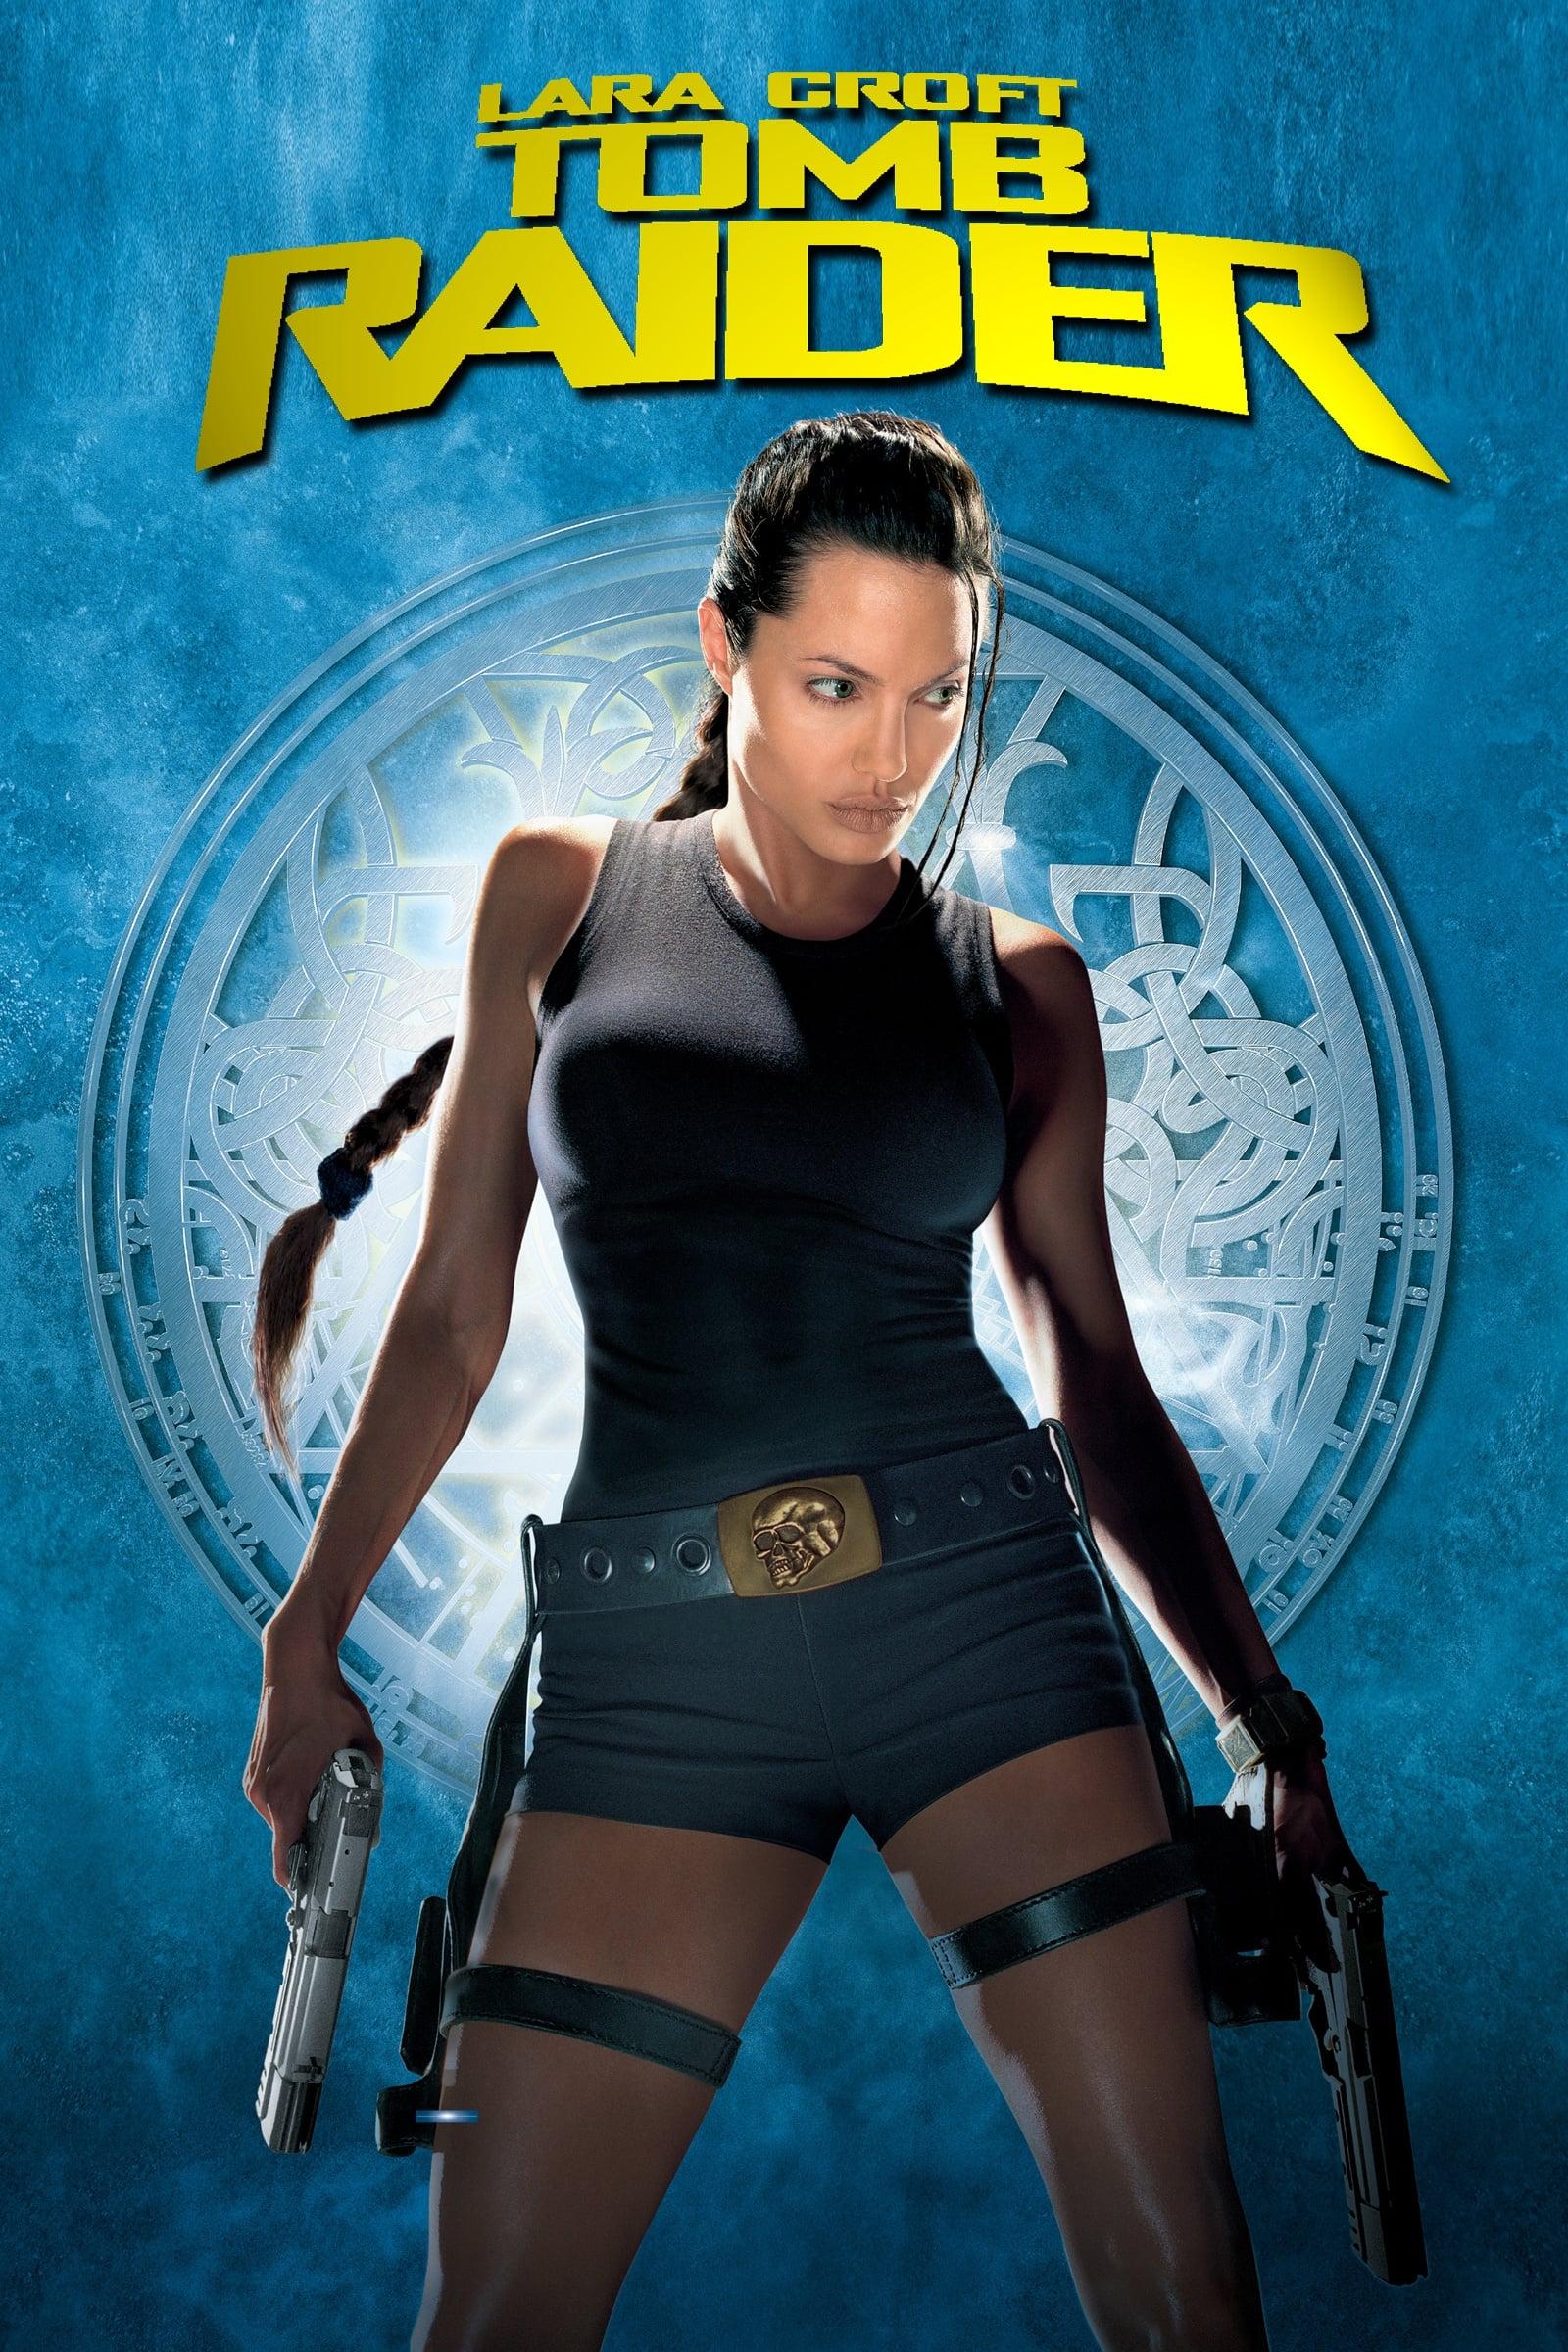 1440x2960 Lara Croft Tomb Raider Portrait 4K Samsung